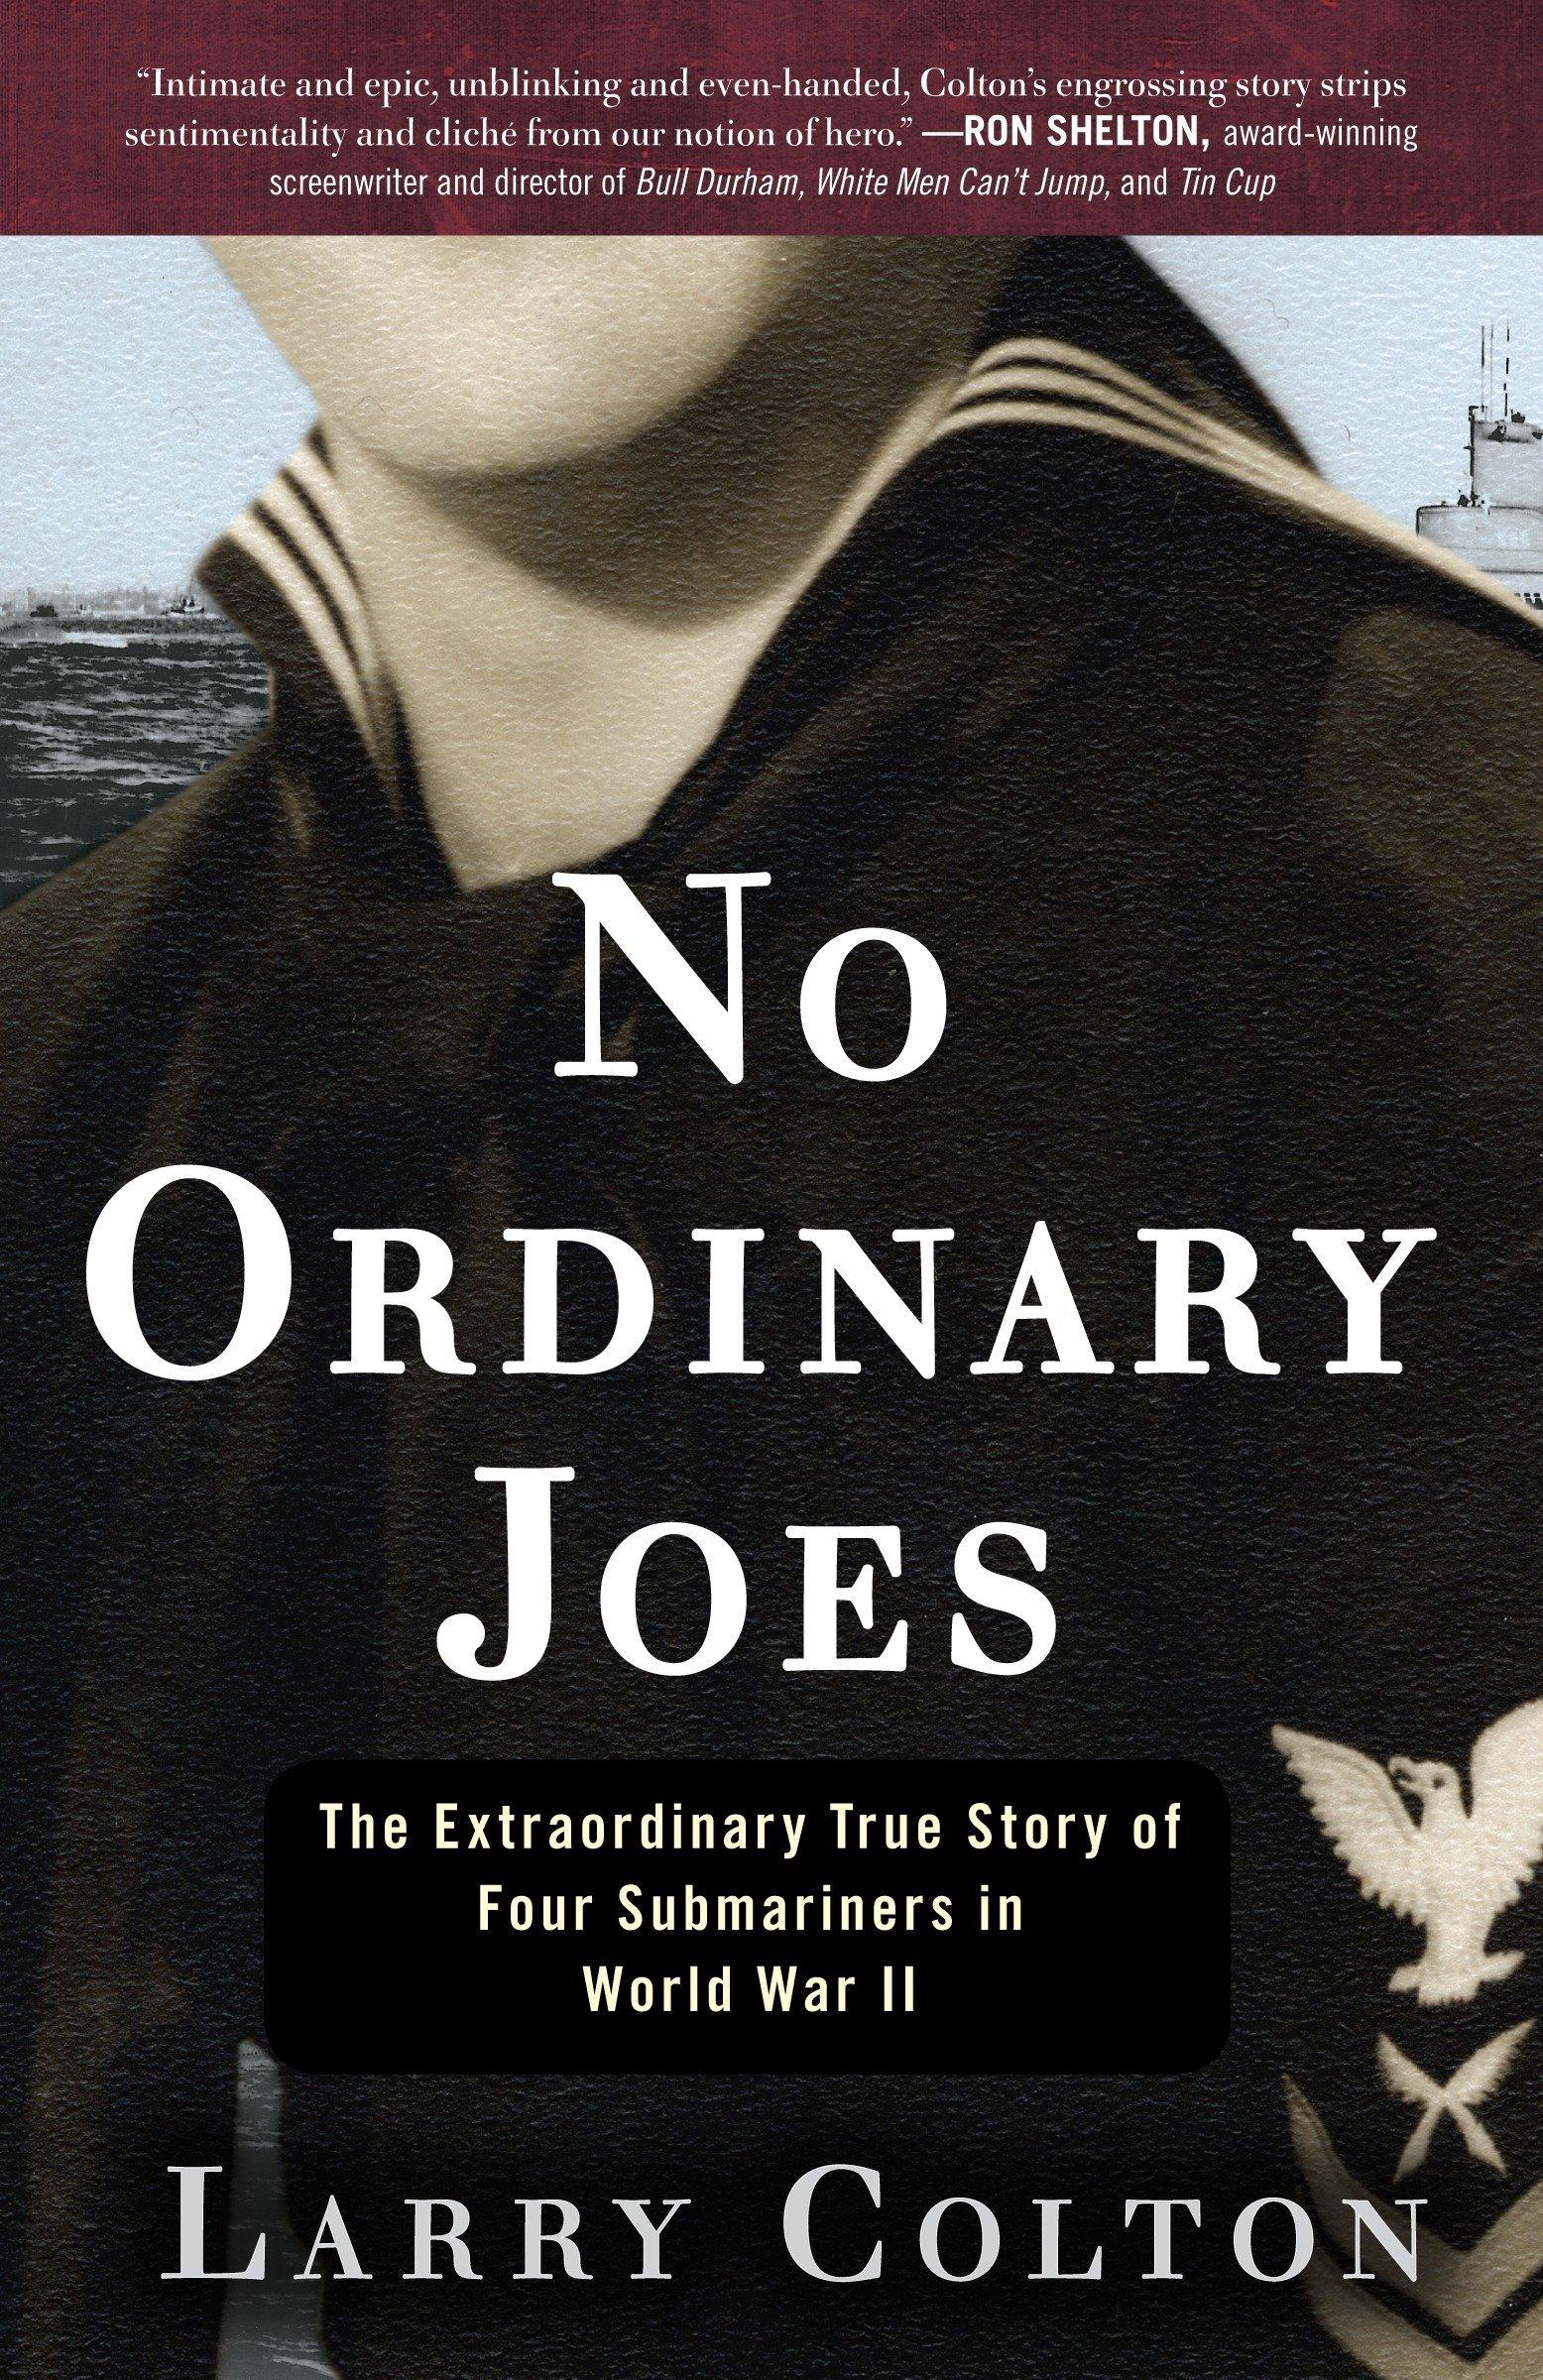 No Ordinary Joes: The Extraordinary True Story of Four ...